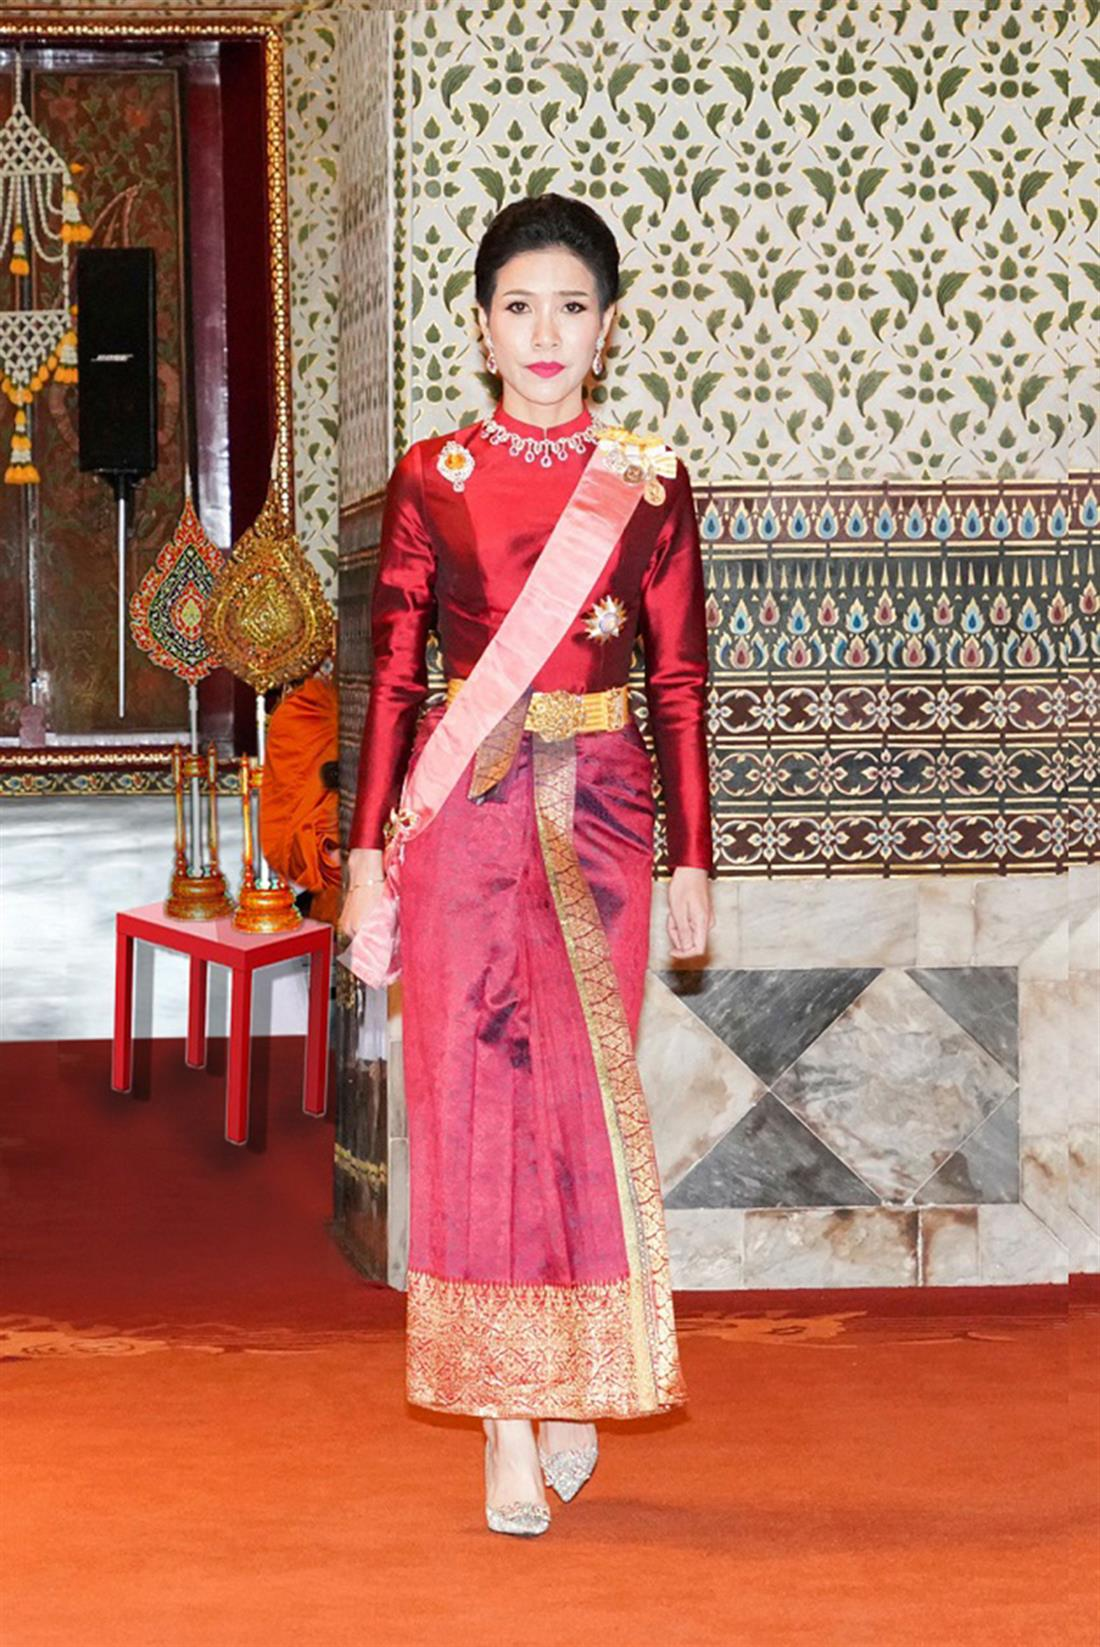 AP - Βασιλιάς Ταϊλάνδης - Μάχα Βατζιραλόνγκορν - Σινεένατ Γονγκβατζιραπάκντι